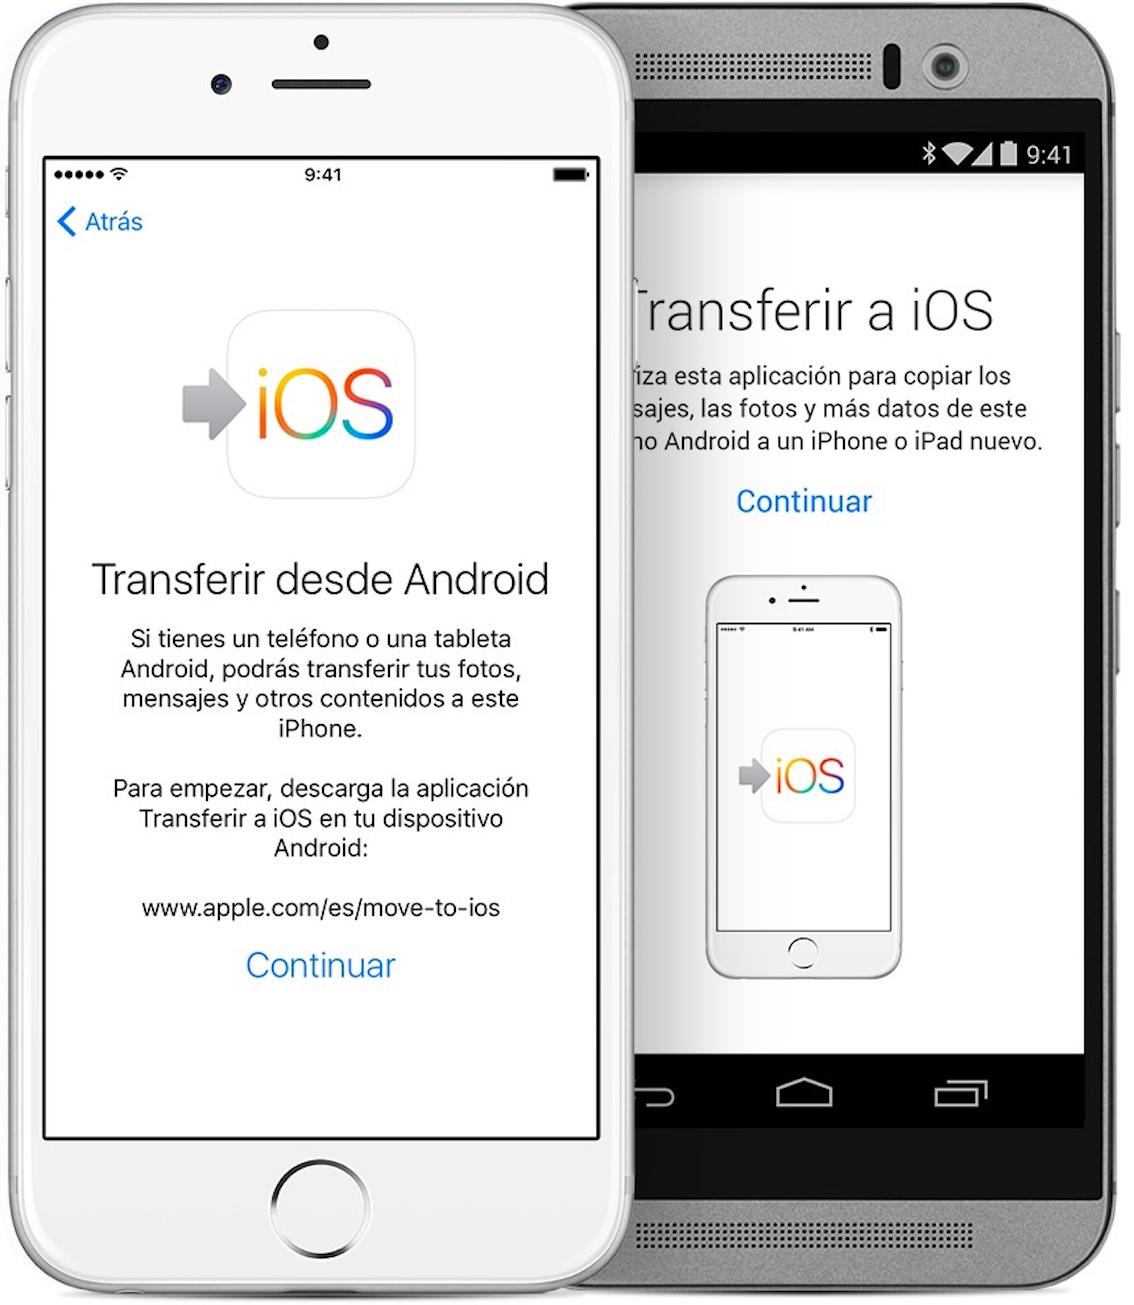 Transferir datos de Samsung a iPhone con Transferir a iOS - Paso 2